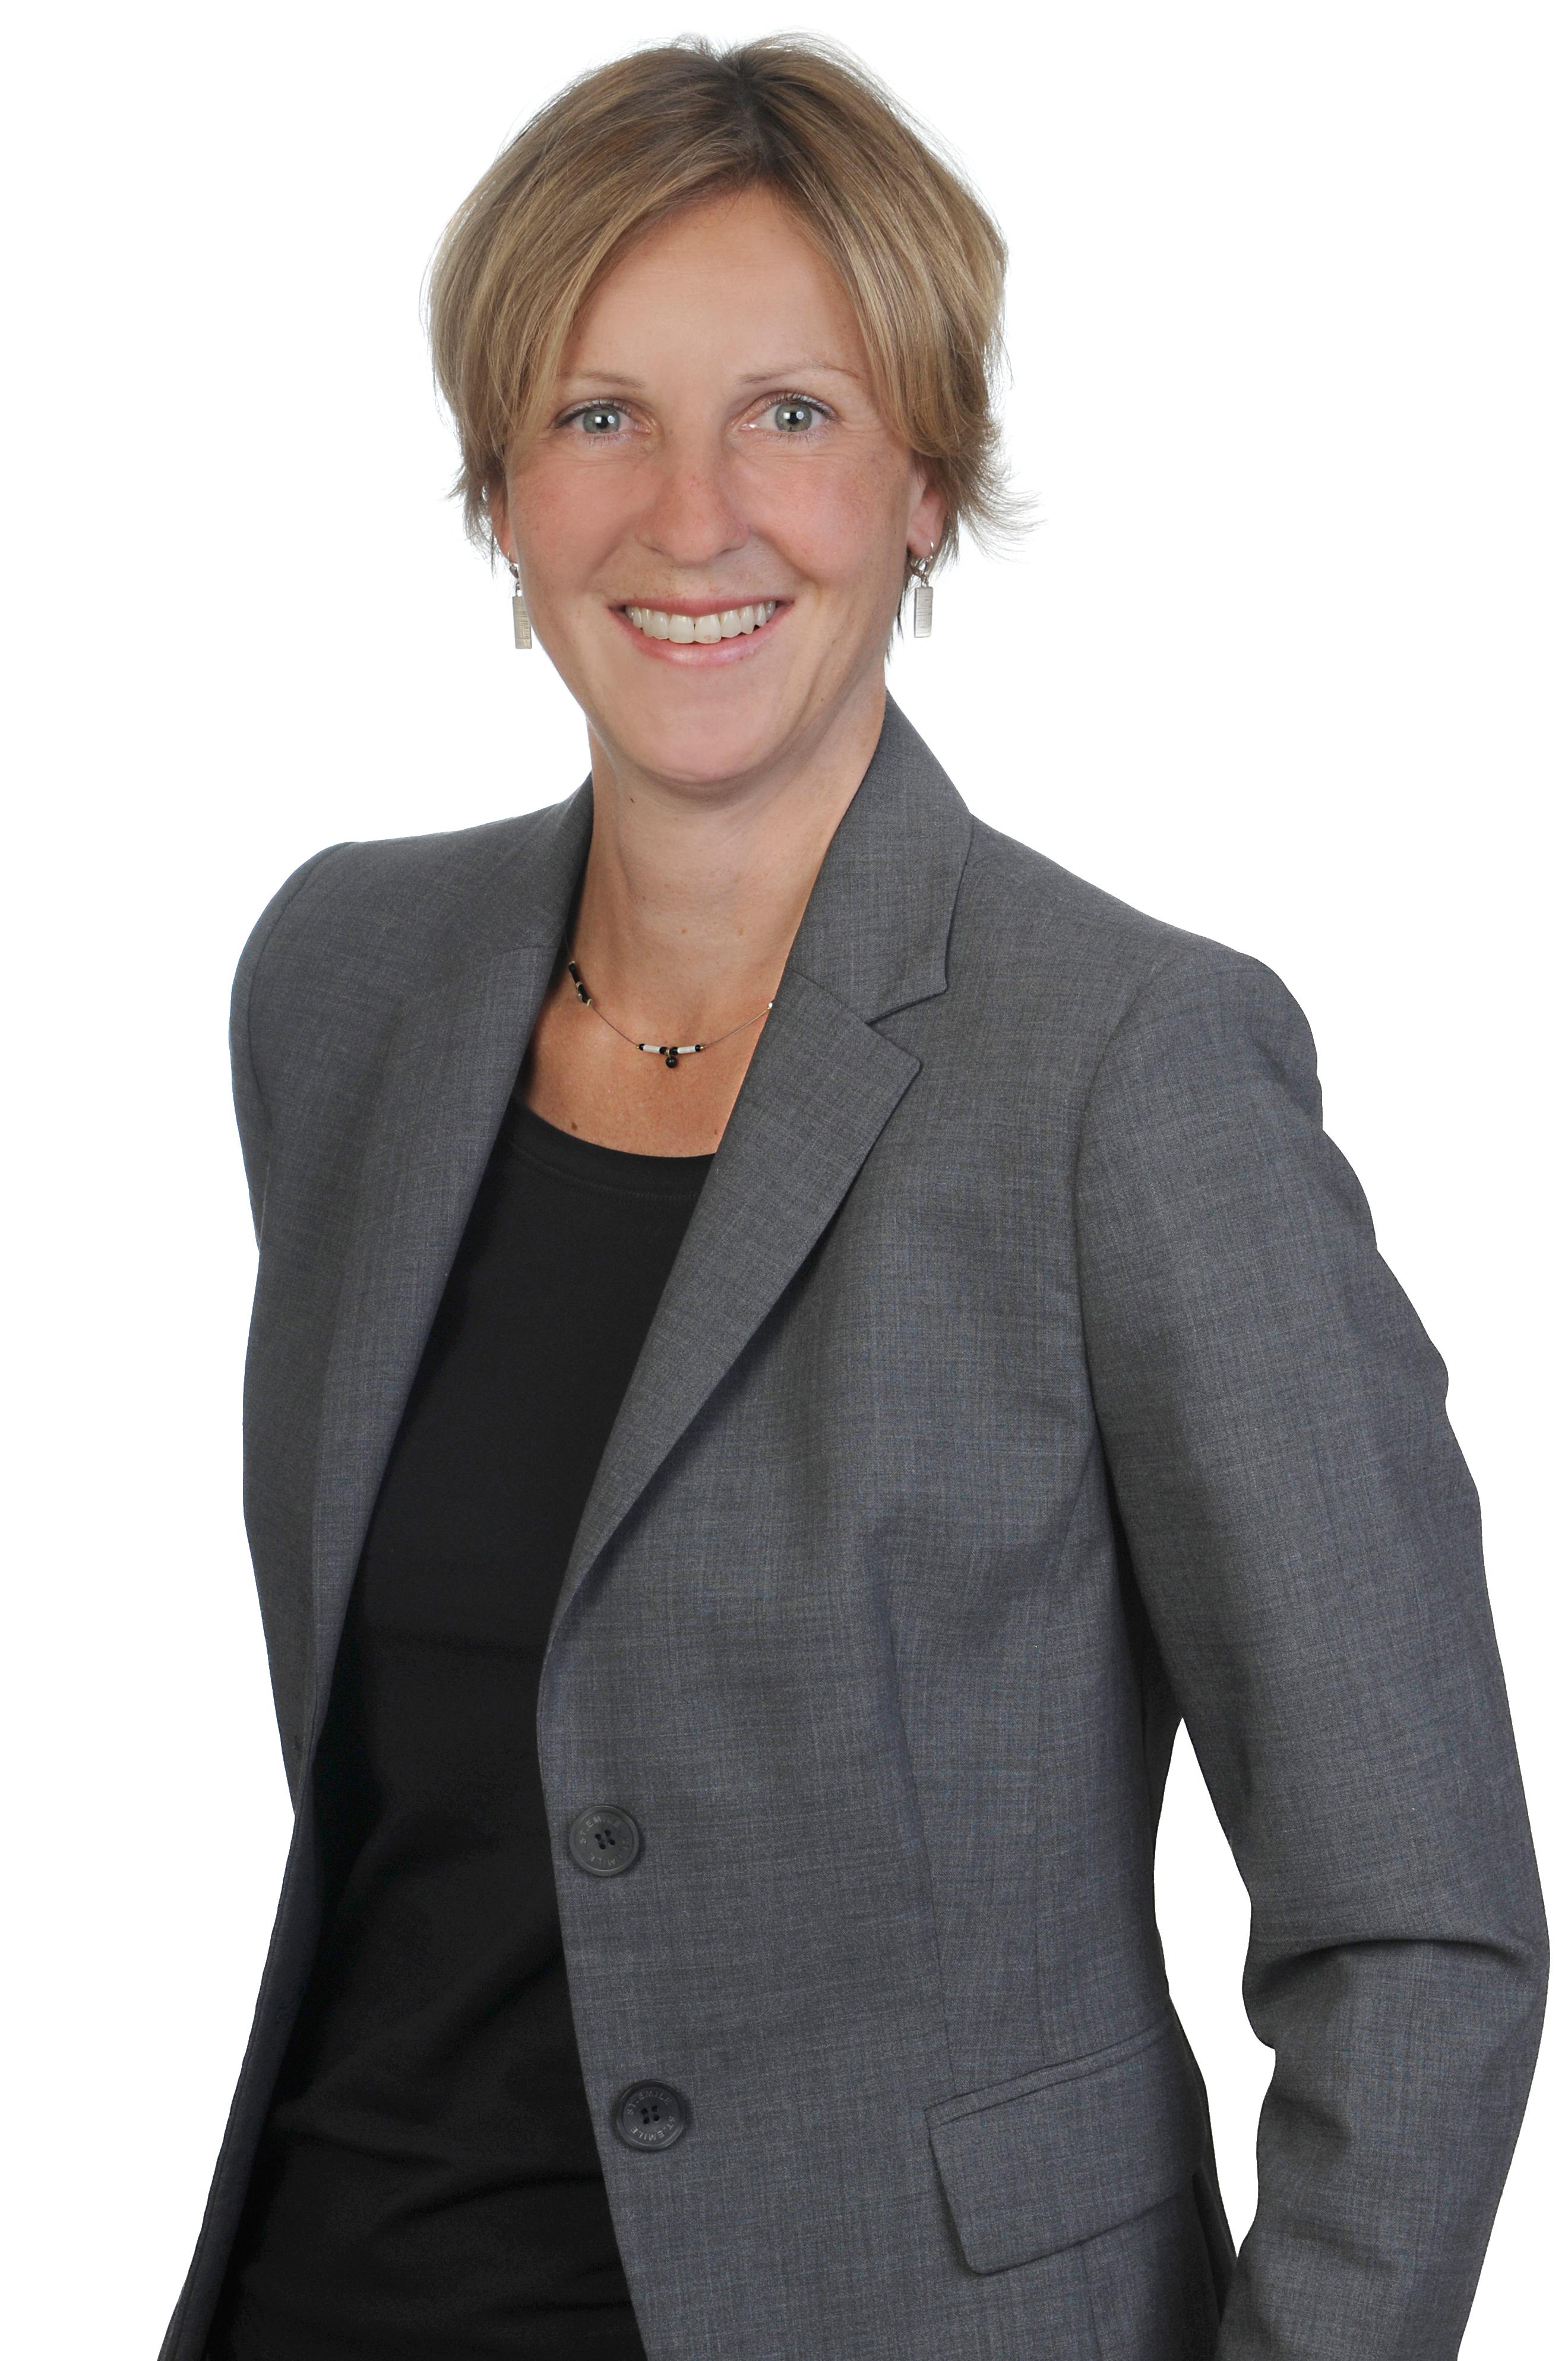 Rain Dr Melanie Höveler